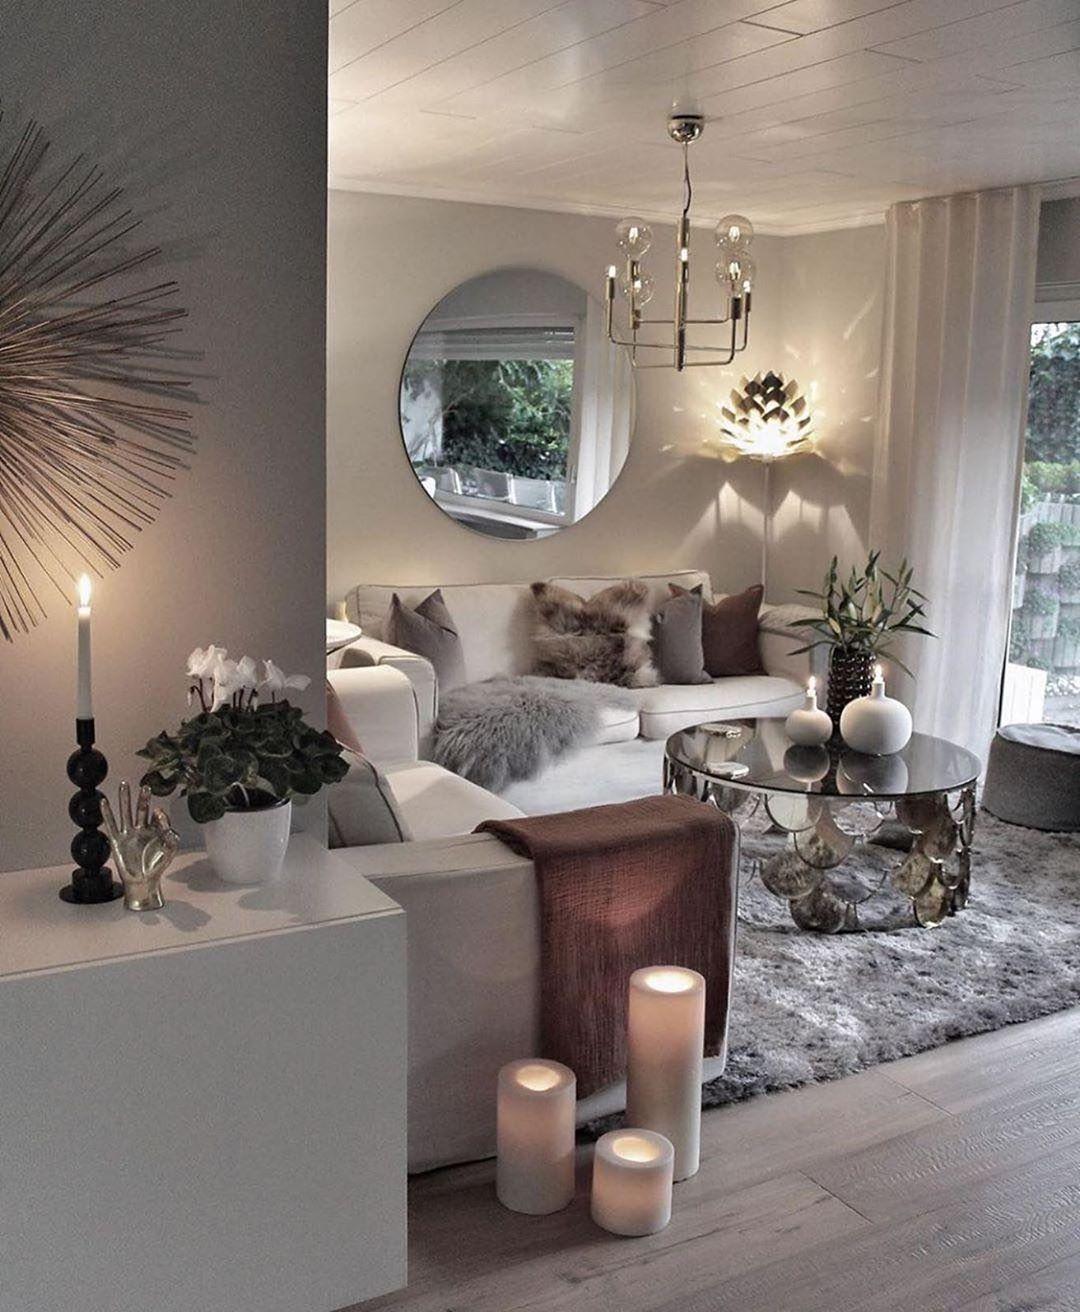 Pin By Rose On H O M E G O A L S Living Room Designs Living Room Inspiration Living Room Decor